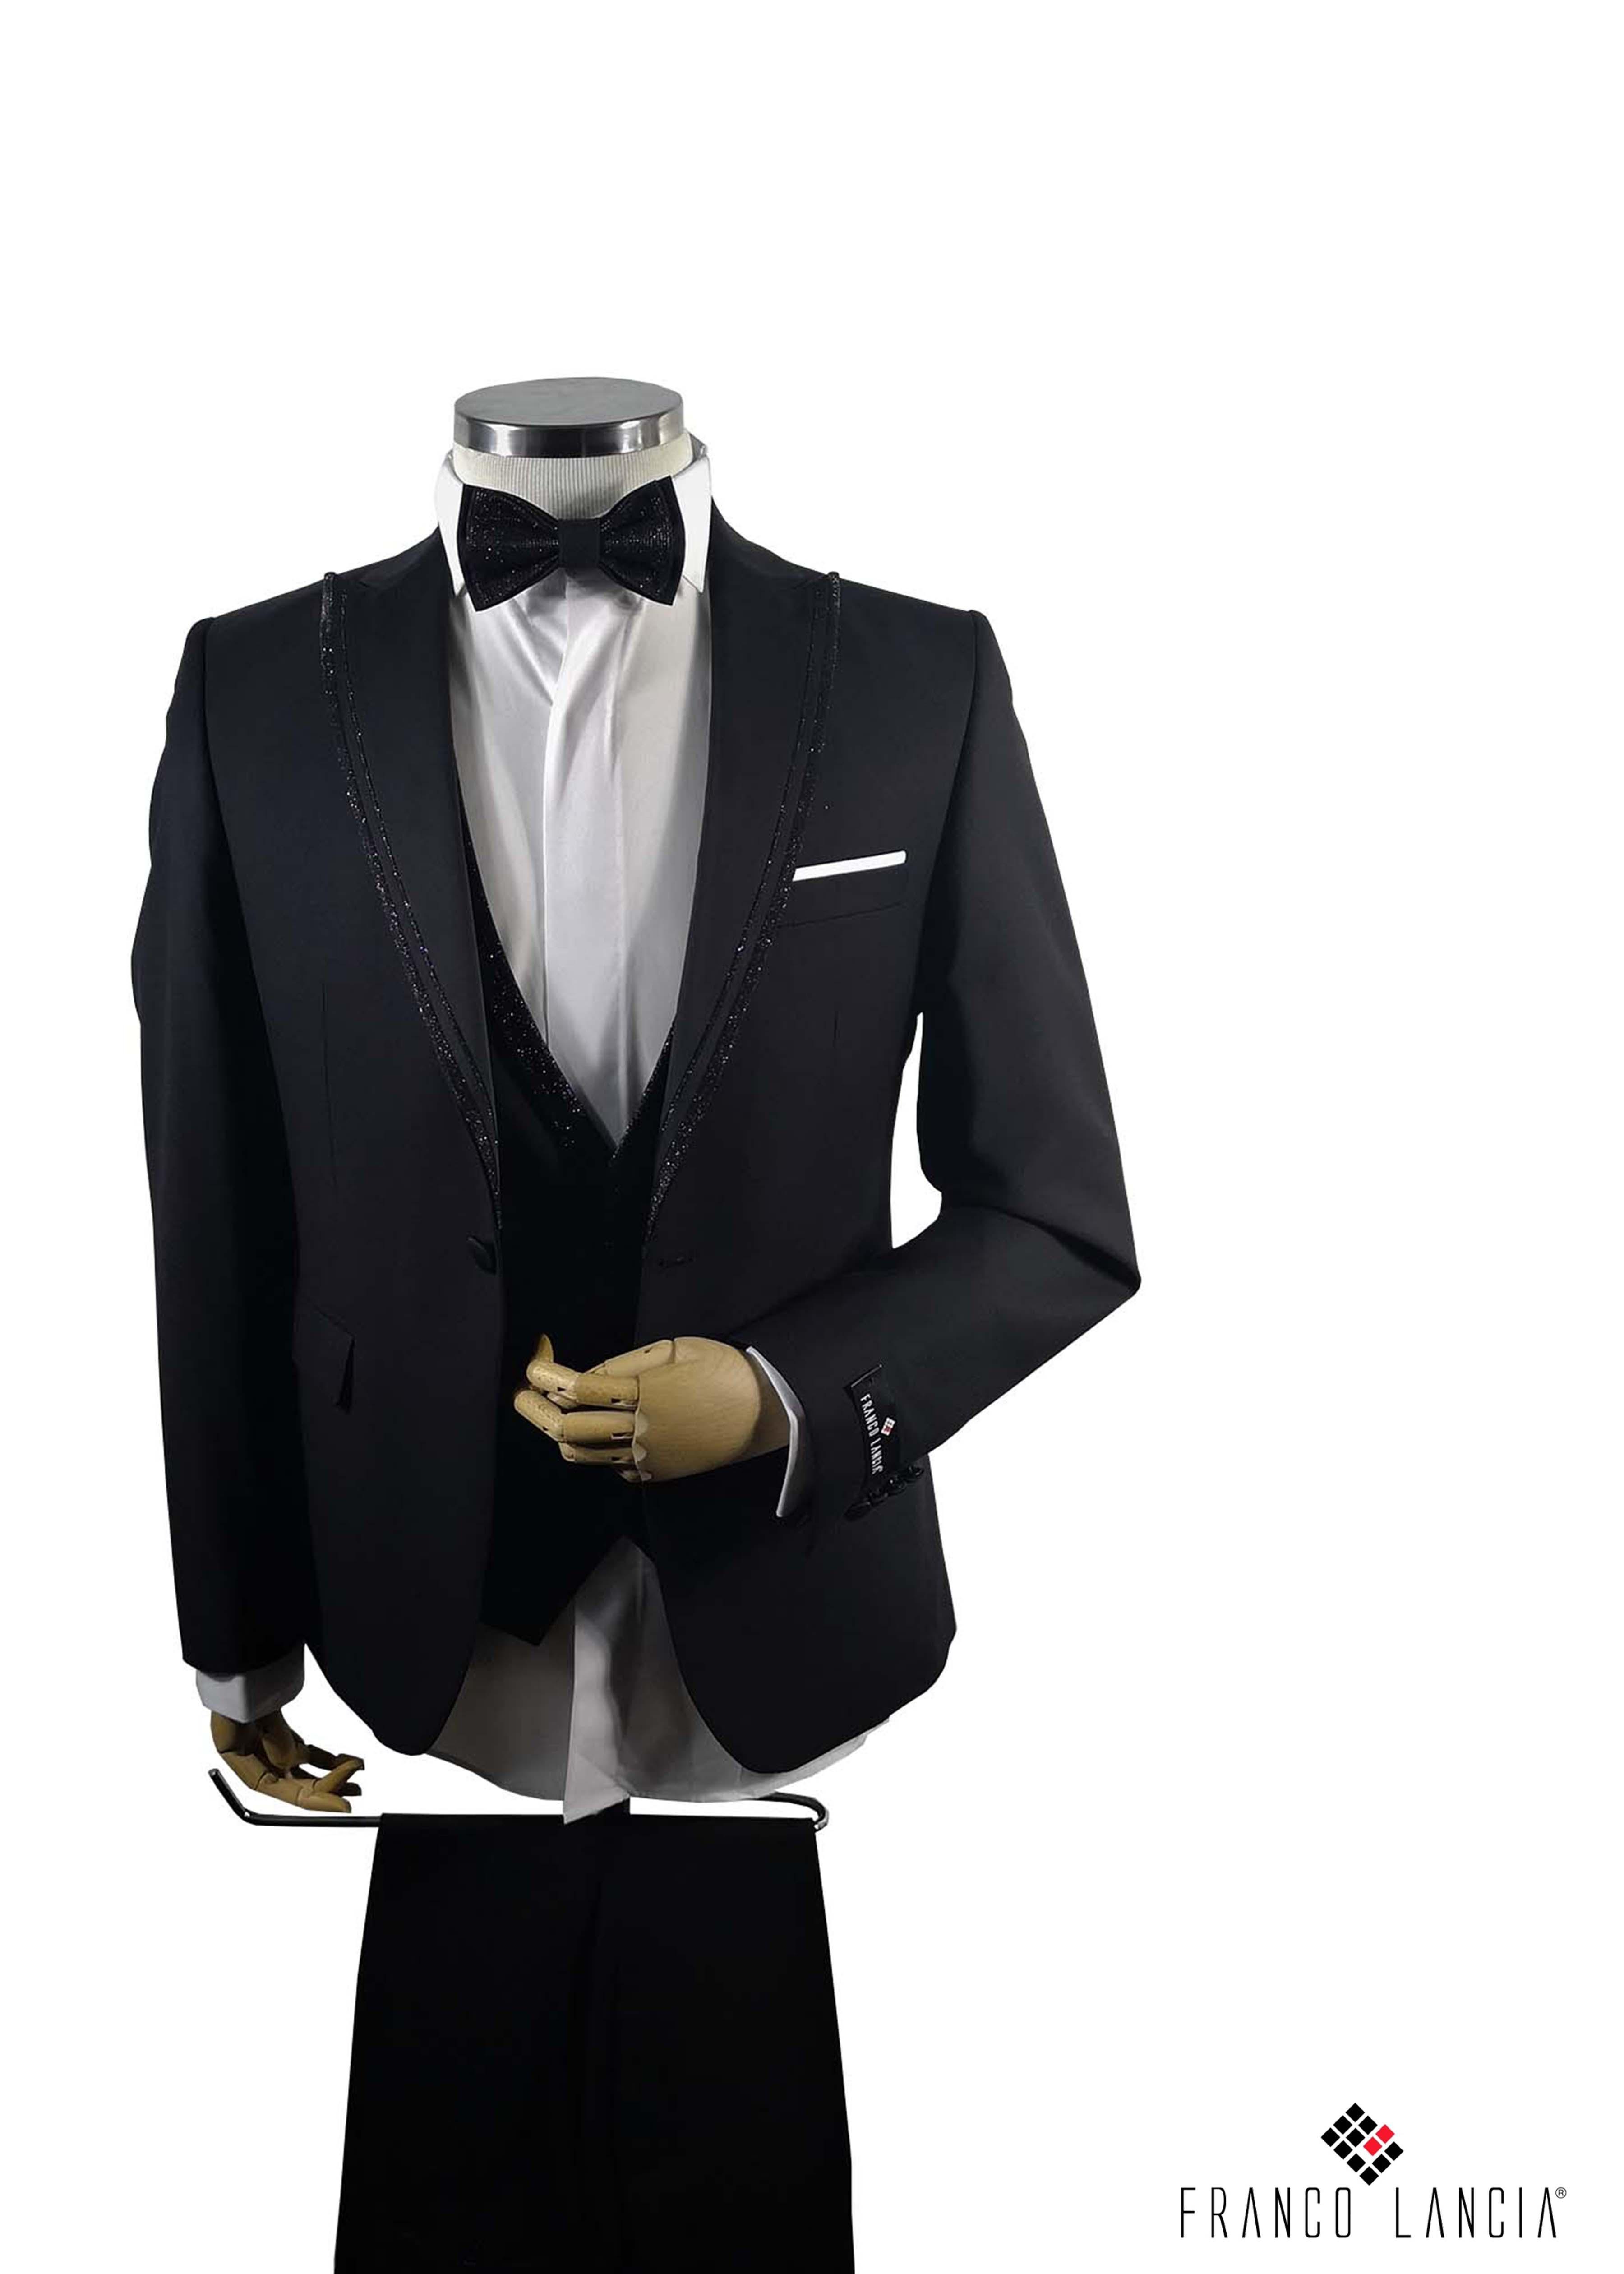 Single Breasted Black Tuxedo